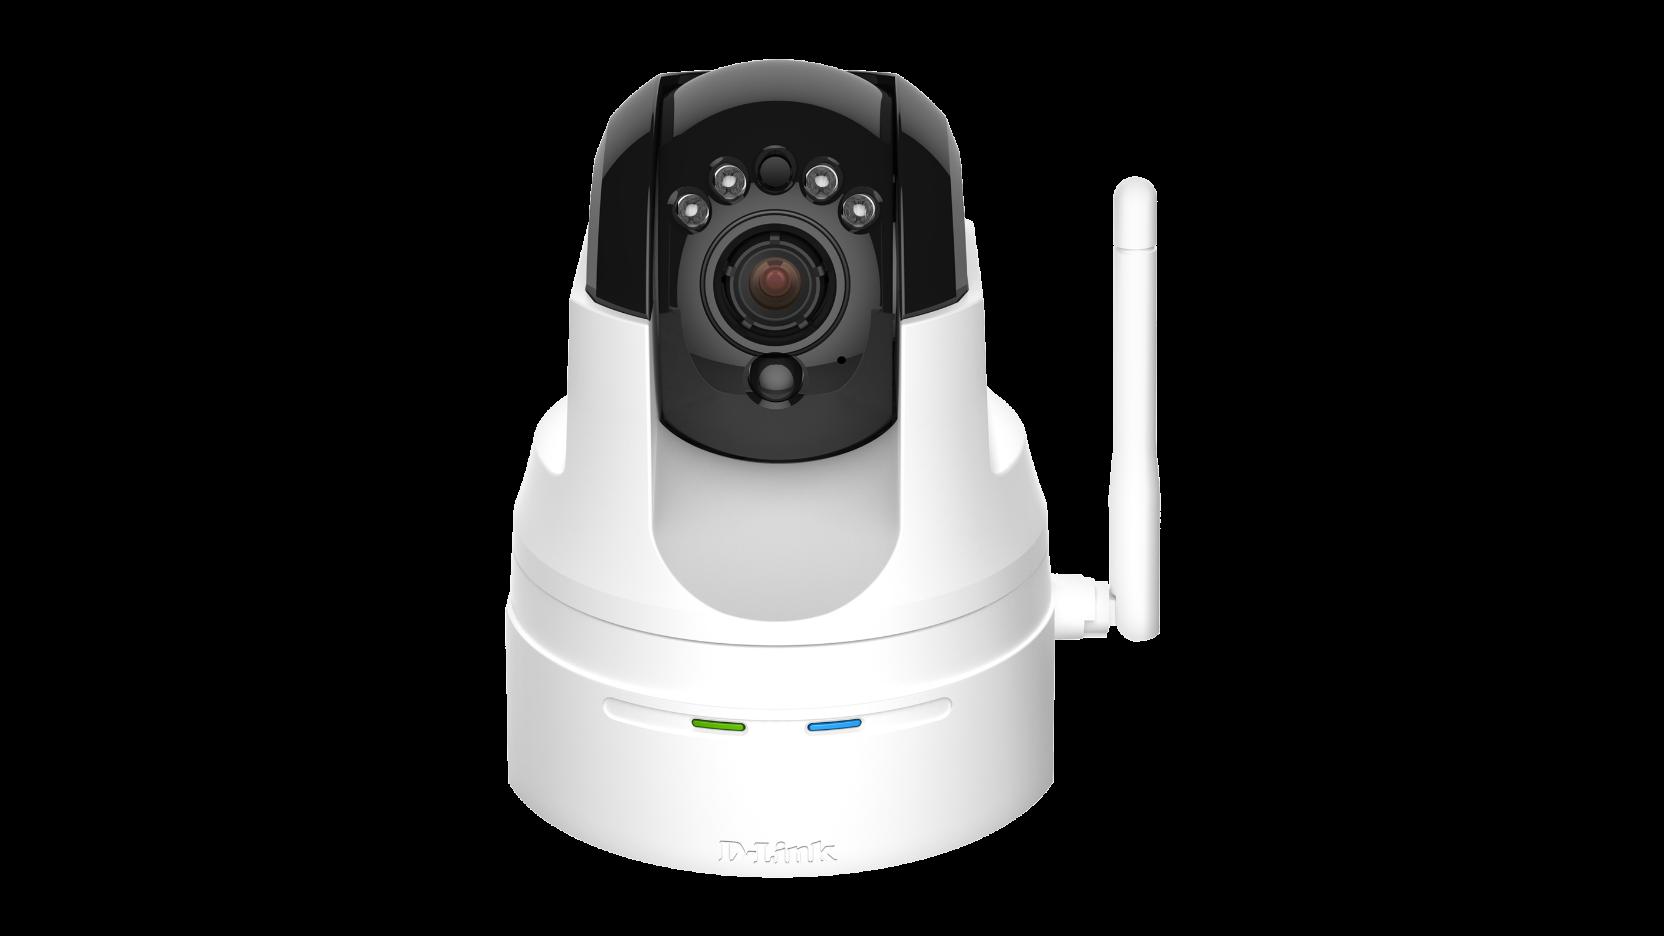 D-Link DCS-6818 Rev.B IP Camera Drivers Windows